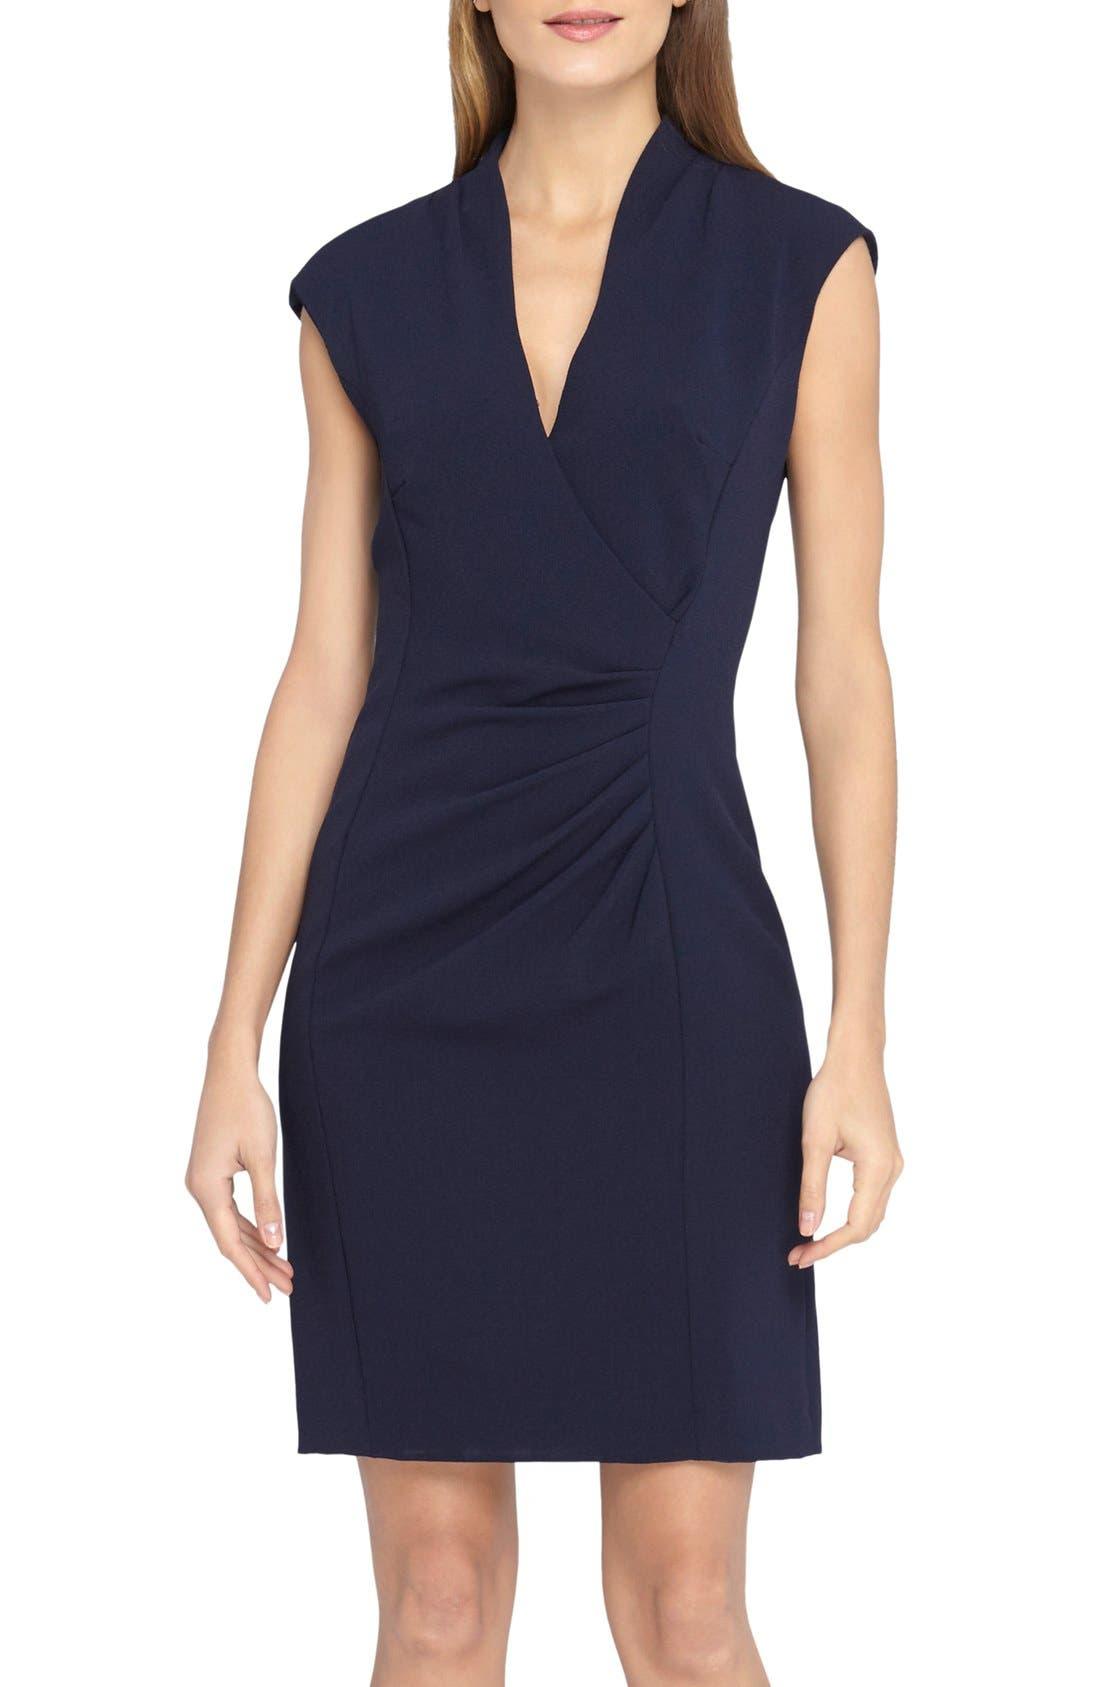 Alternate Image 1 Selected - Tahari V-Neck Crepe Sheath Dress (Regular & Petite)